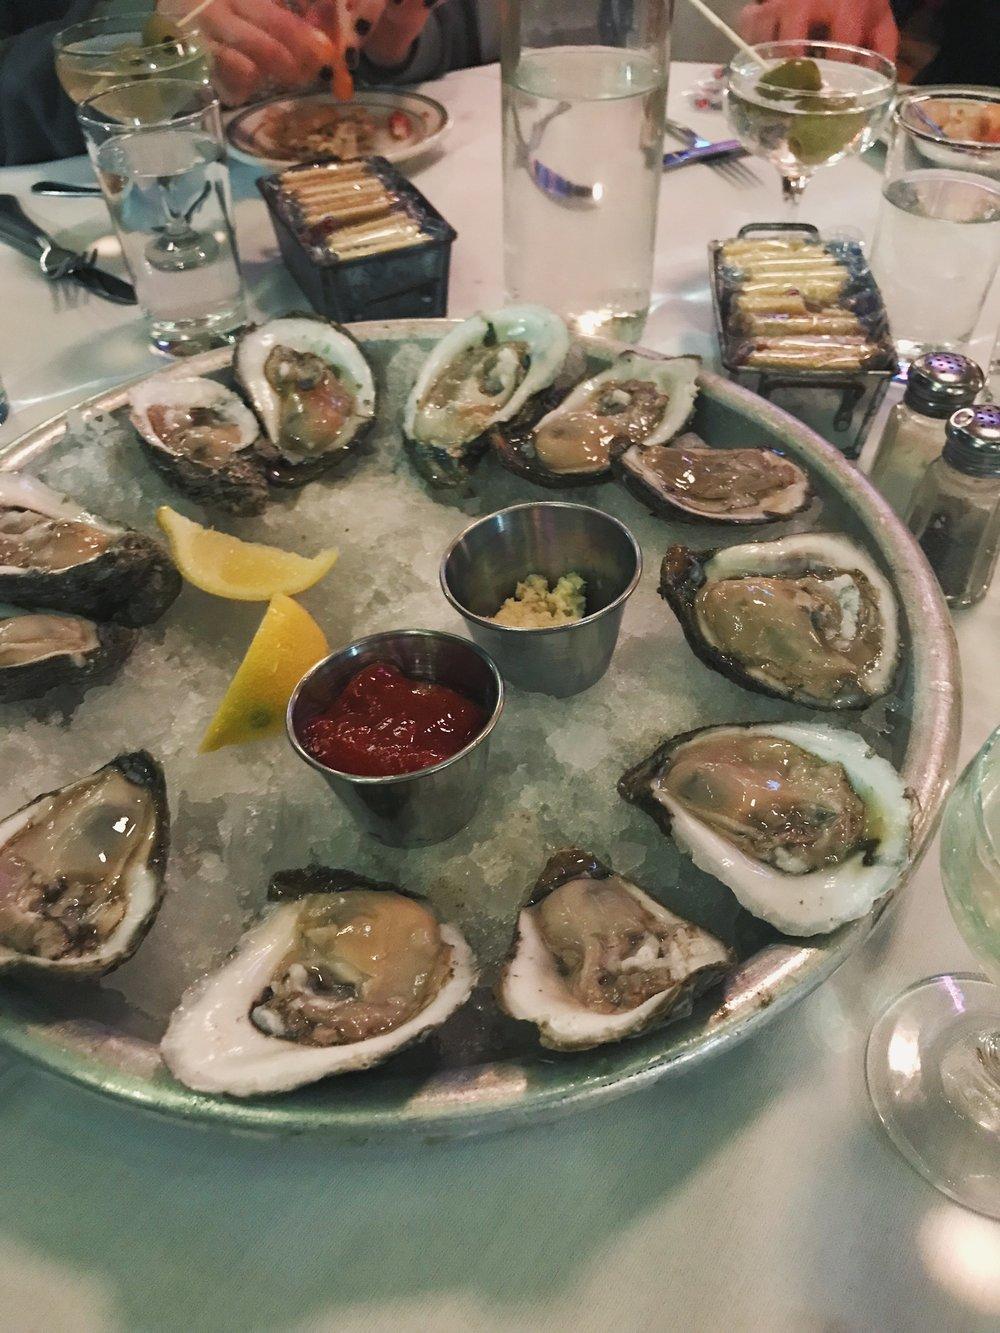 oysters-superior-seafood-new-orleans-lauren-schwaiger-travel-blog.jpg